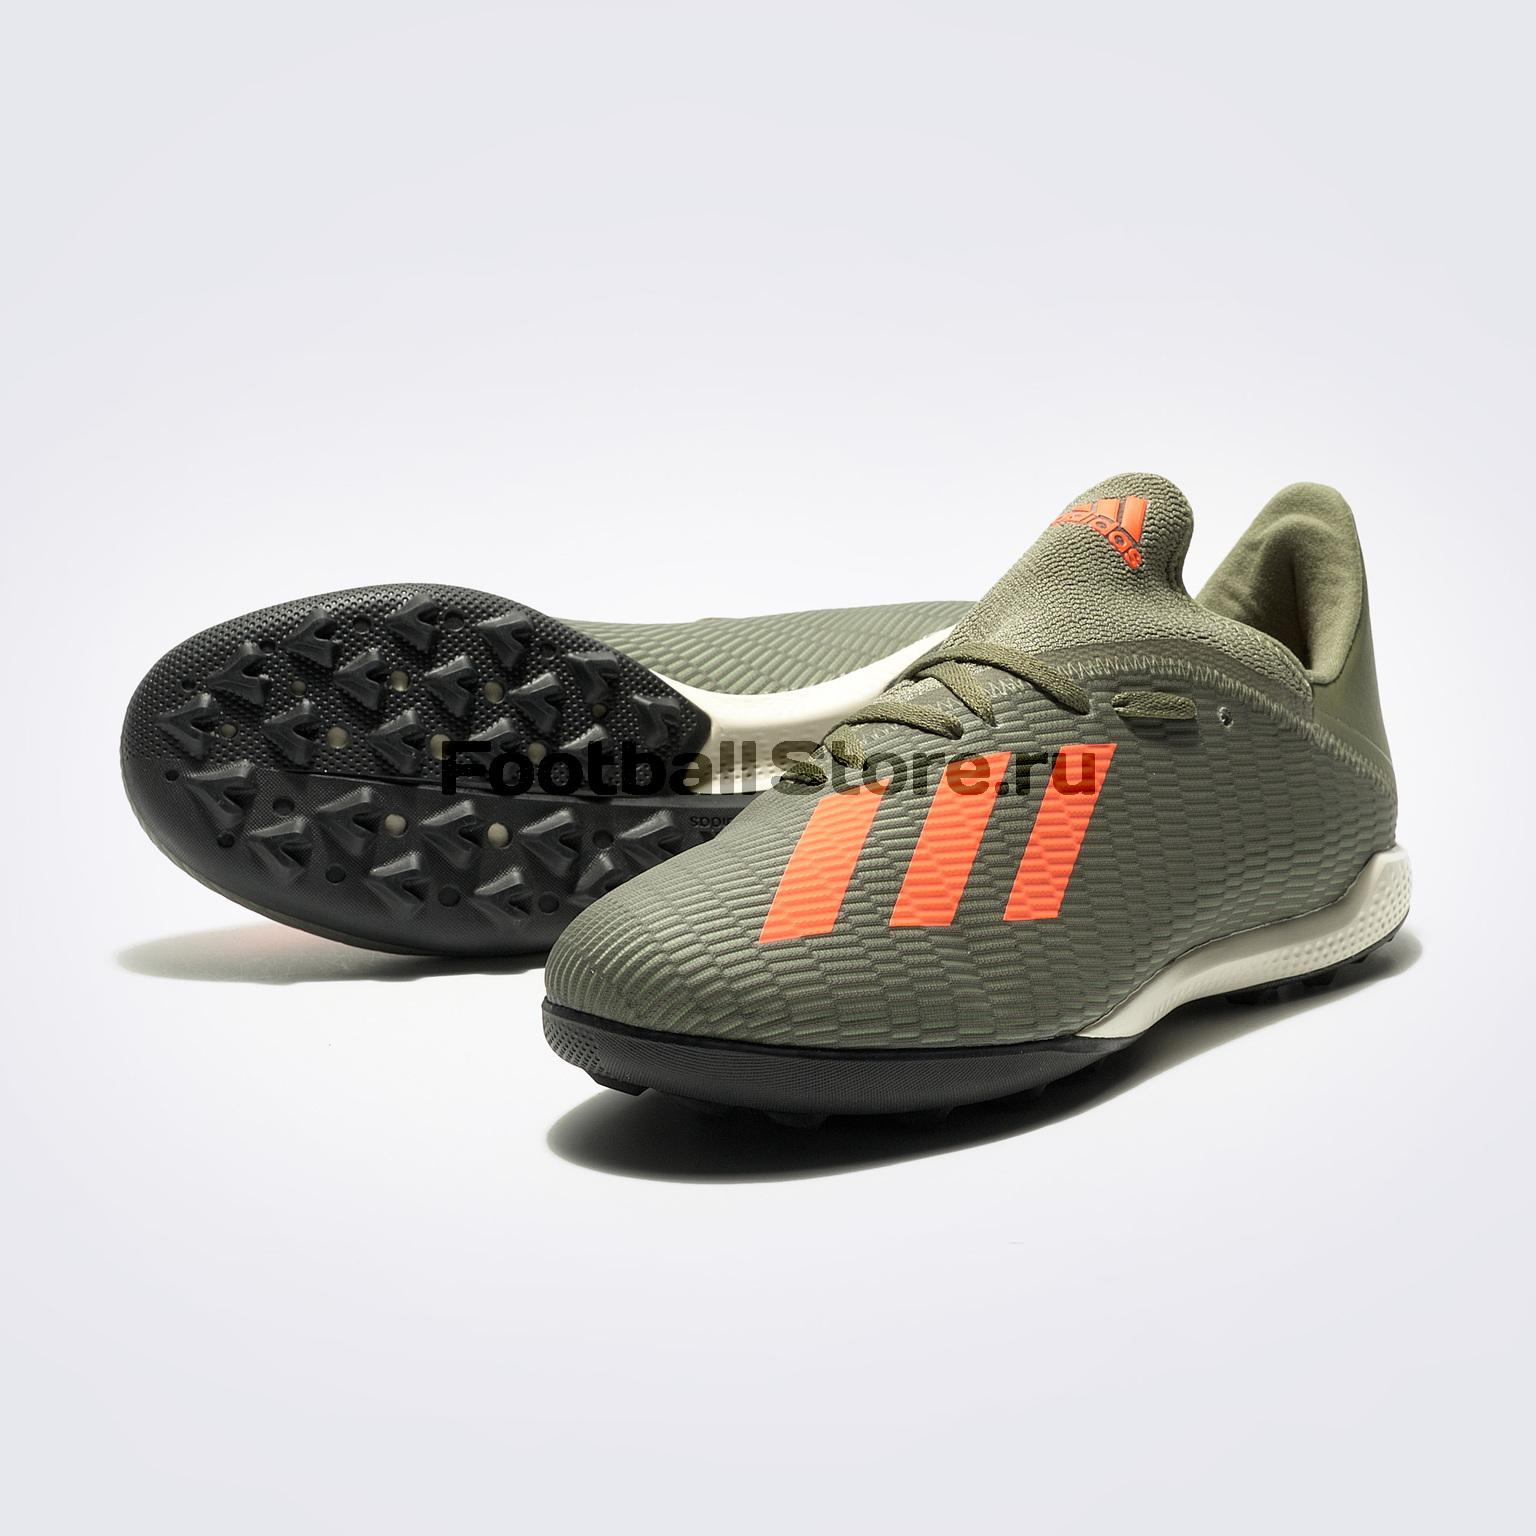 Шиповки Adidas X 19.3 TF EF8366